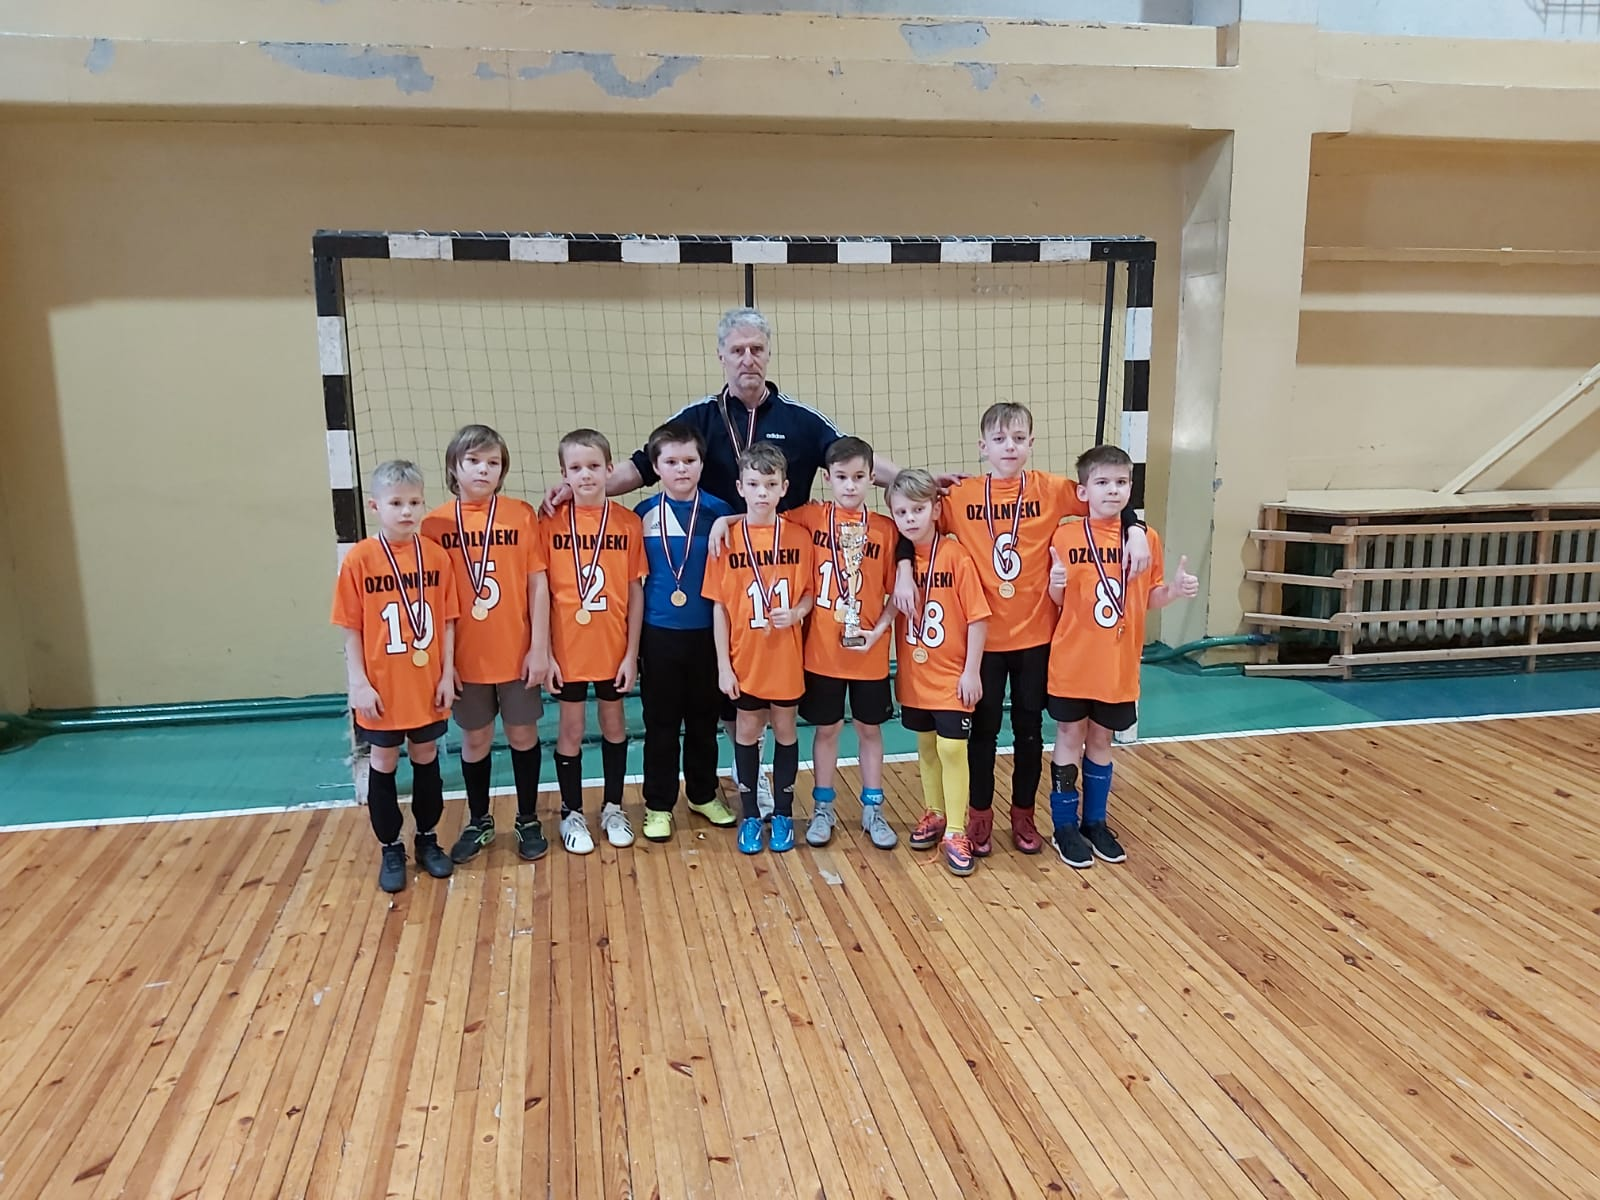 Zemgales reģiona čempioni - Ozolnieku Sporta skolas jaunie futbolisti